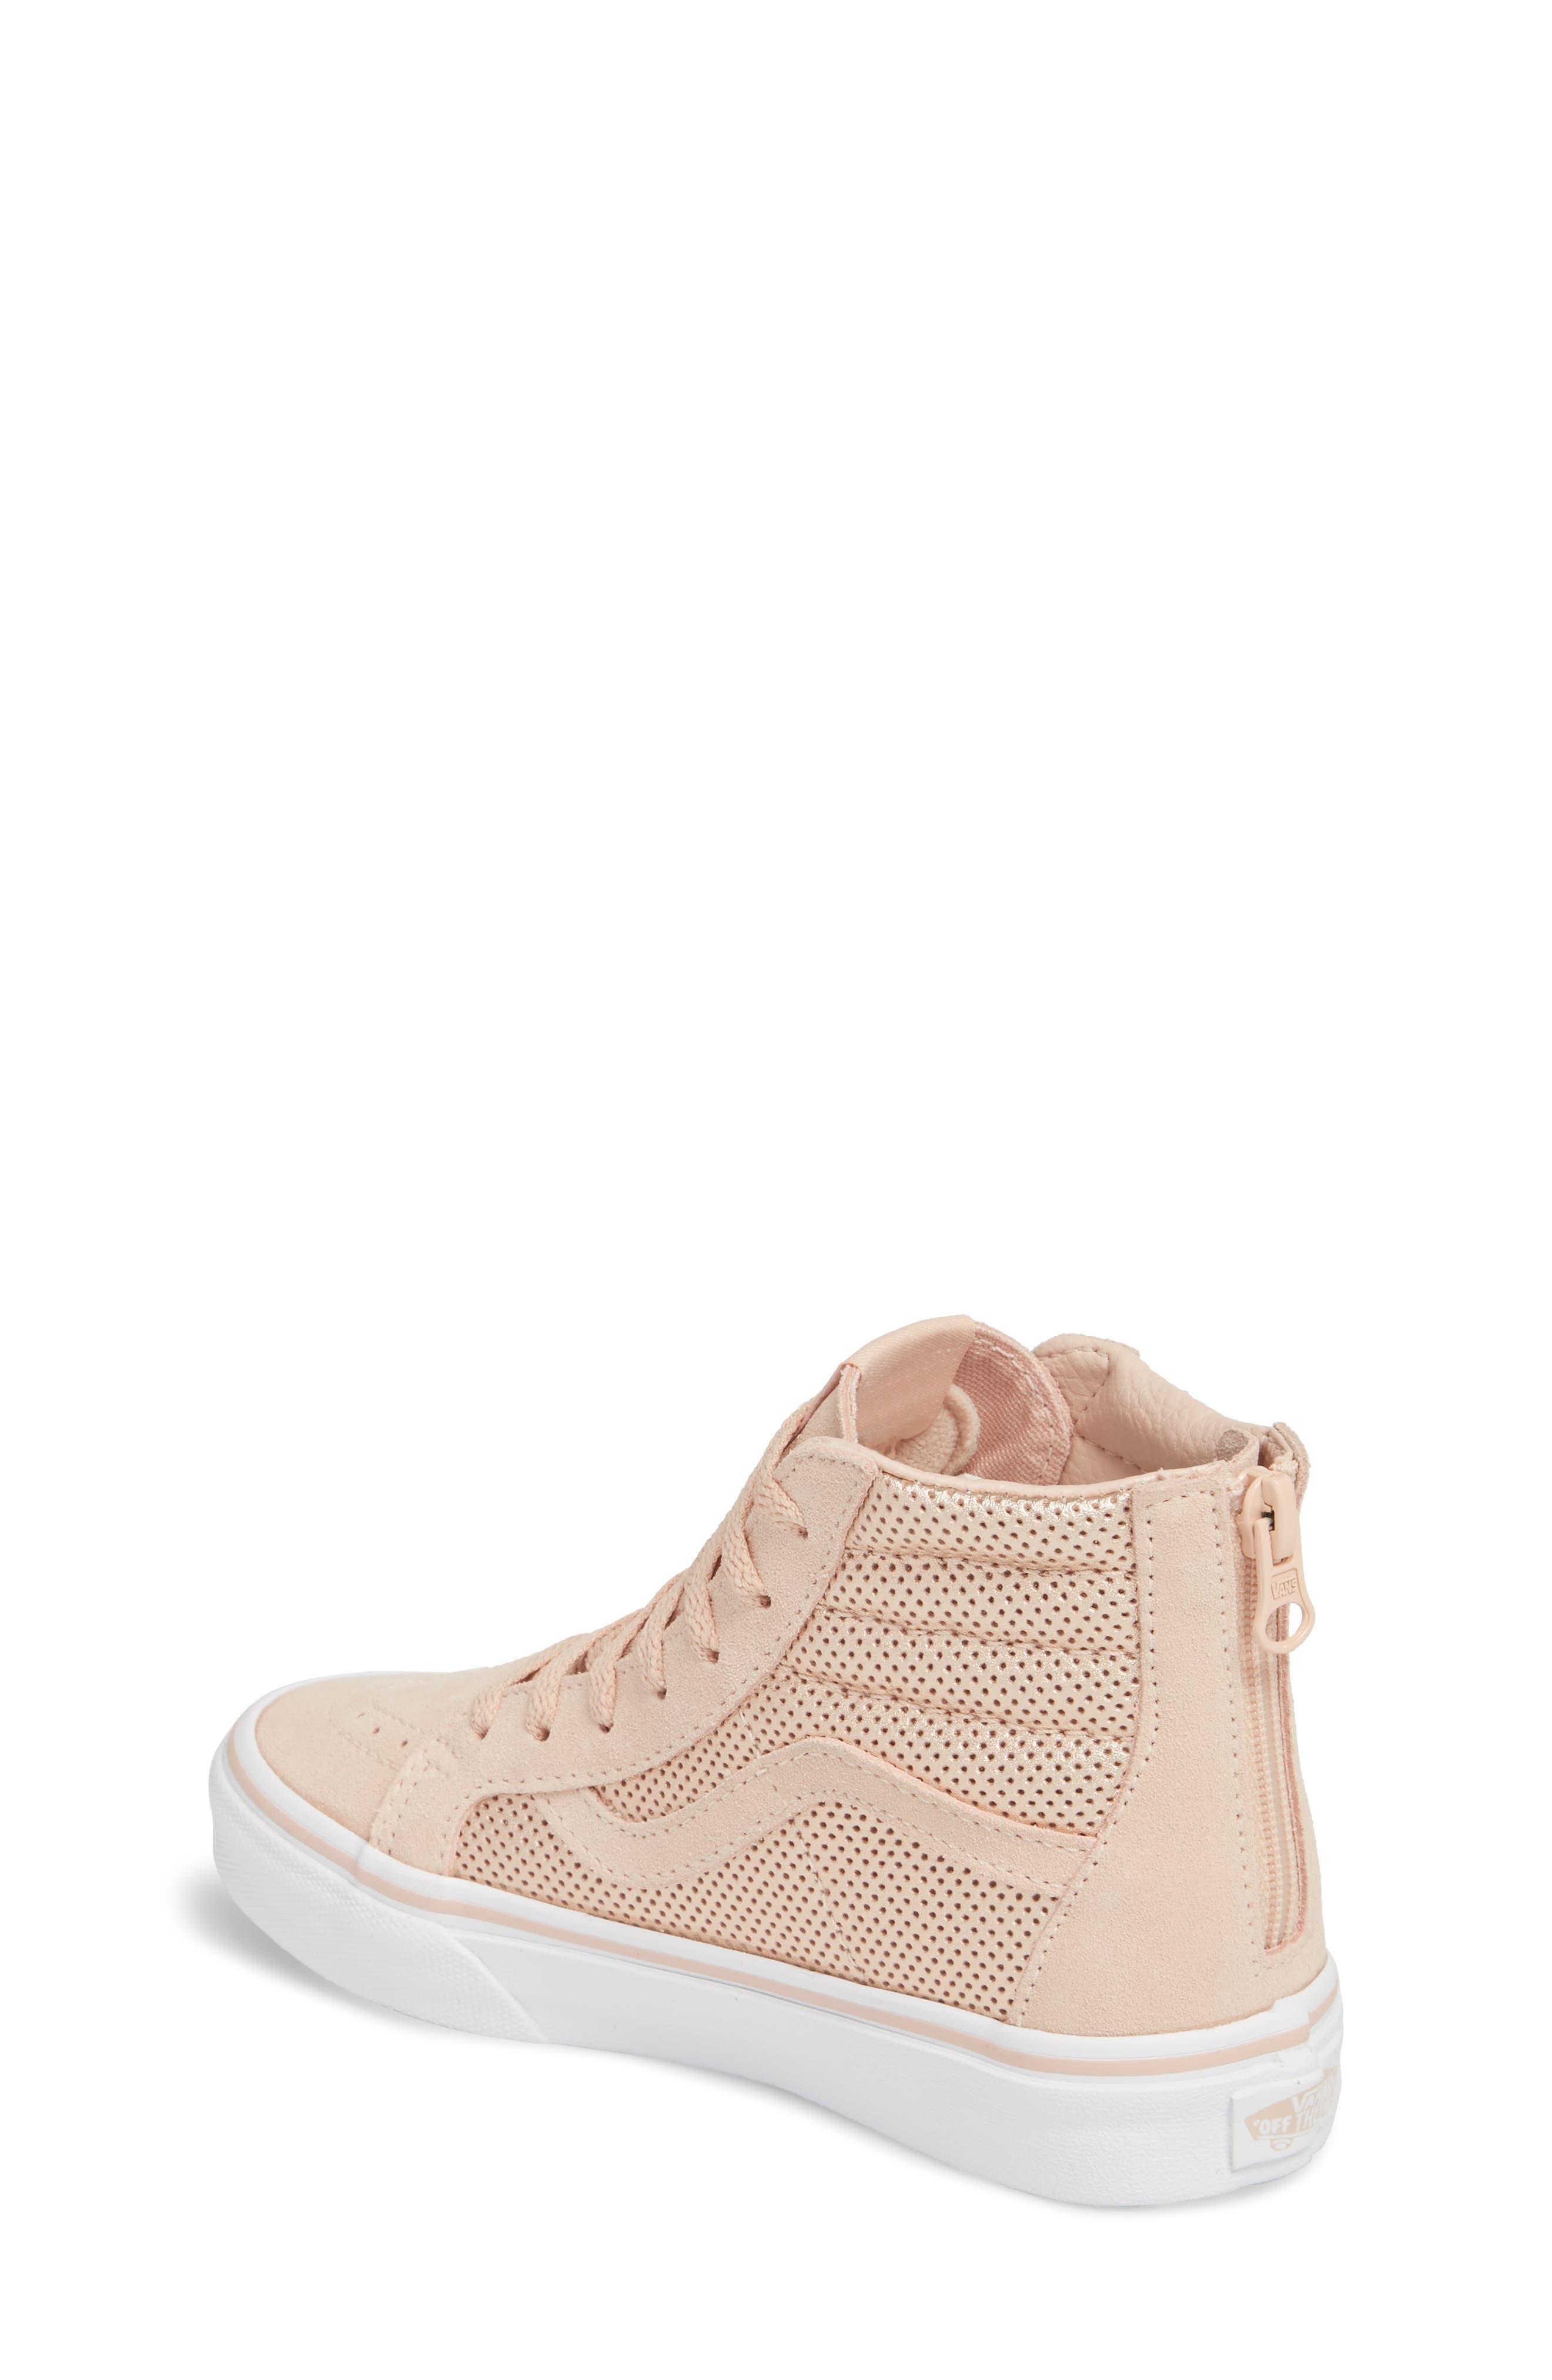 SK8-Hi Zip Sneaker,                             Alternate thumbnail 2, color,                             Rose Gold Suede Leather